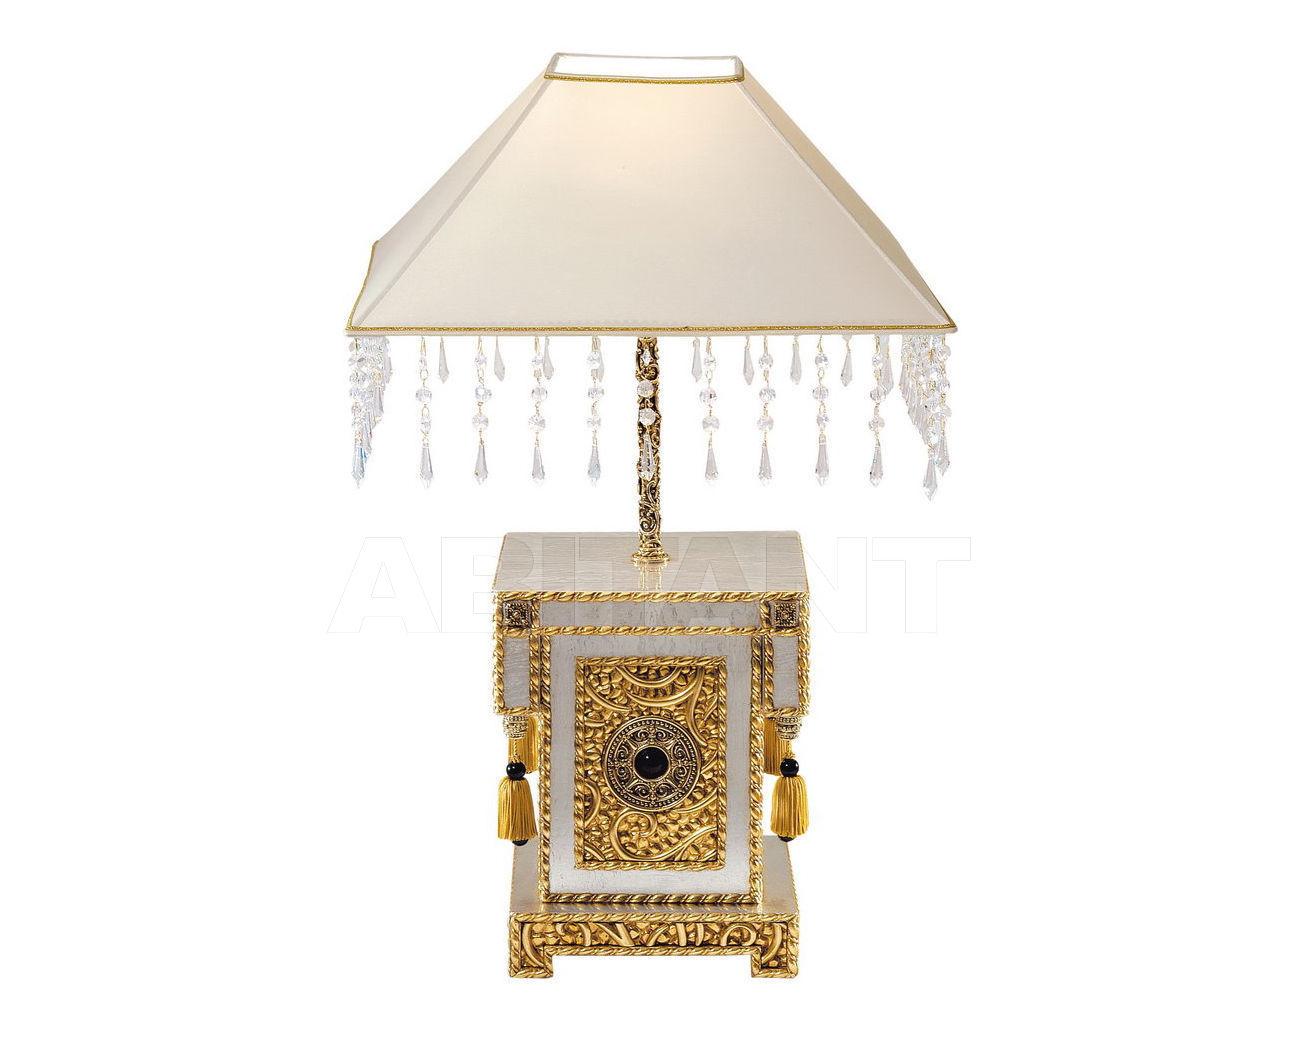 Купить Лампа настольная Colombostile s.p.a. Transculture/lampade 1828 LAK